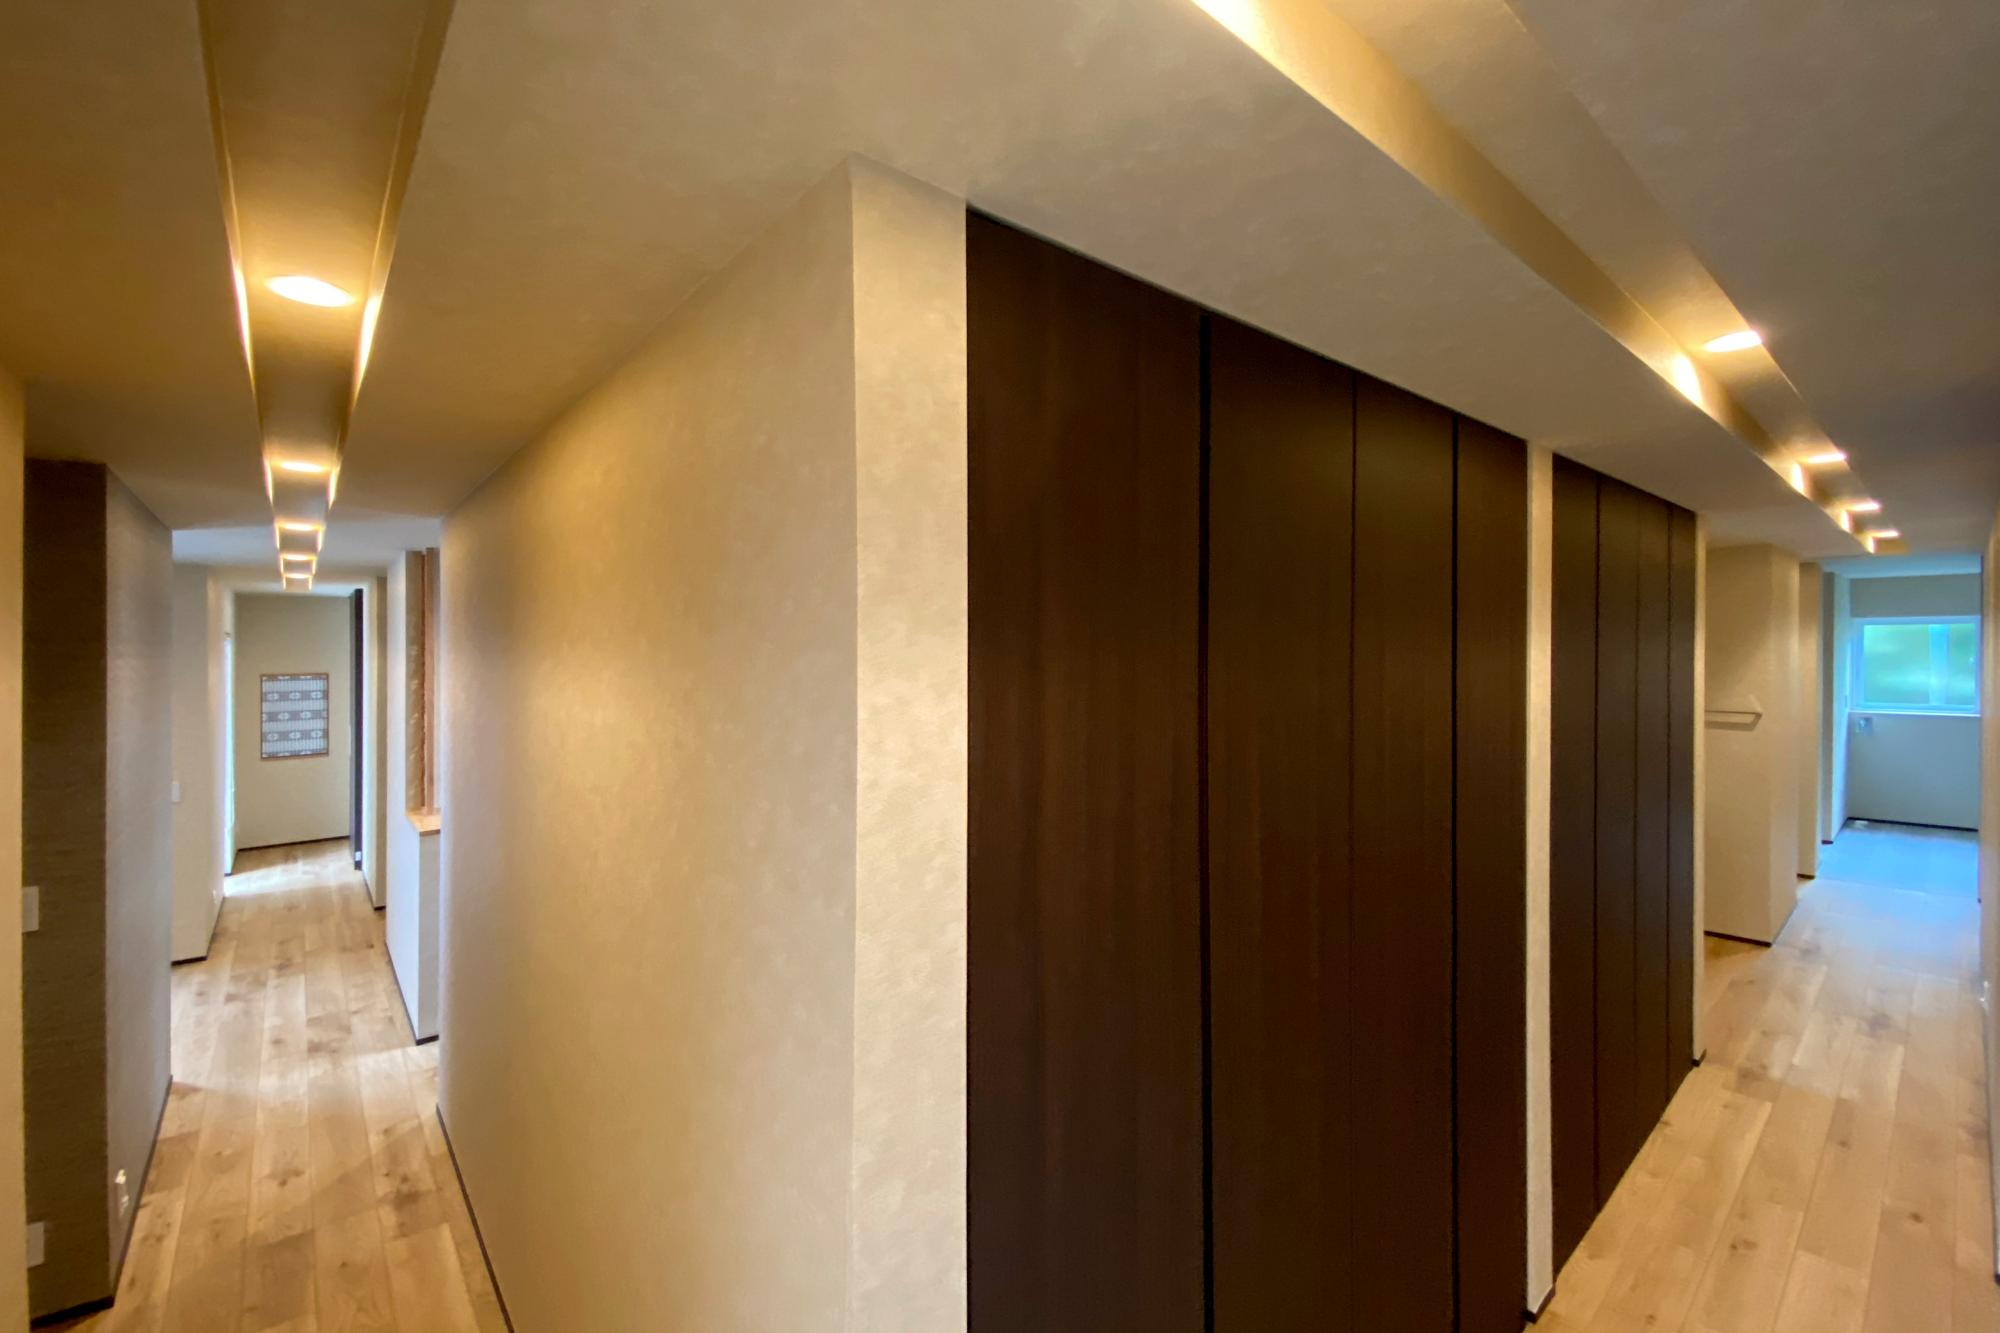 DETAIL HOME(ディテールホーム)「二世帯で住まう和モダン平屋住宅」のモダン・和風・和モダンな居室の実例写真